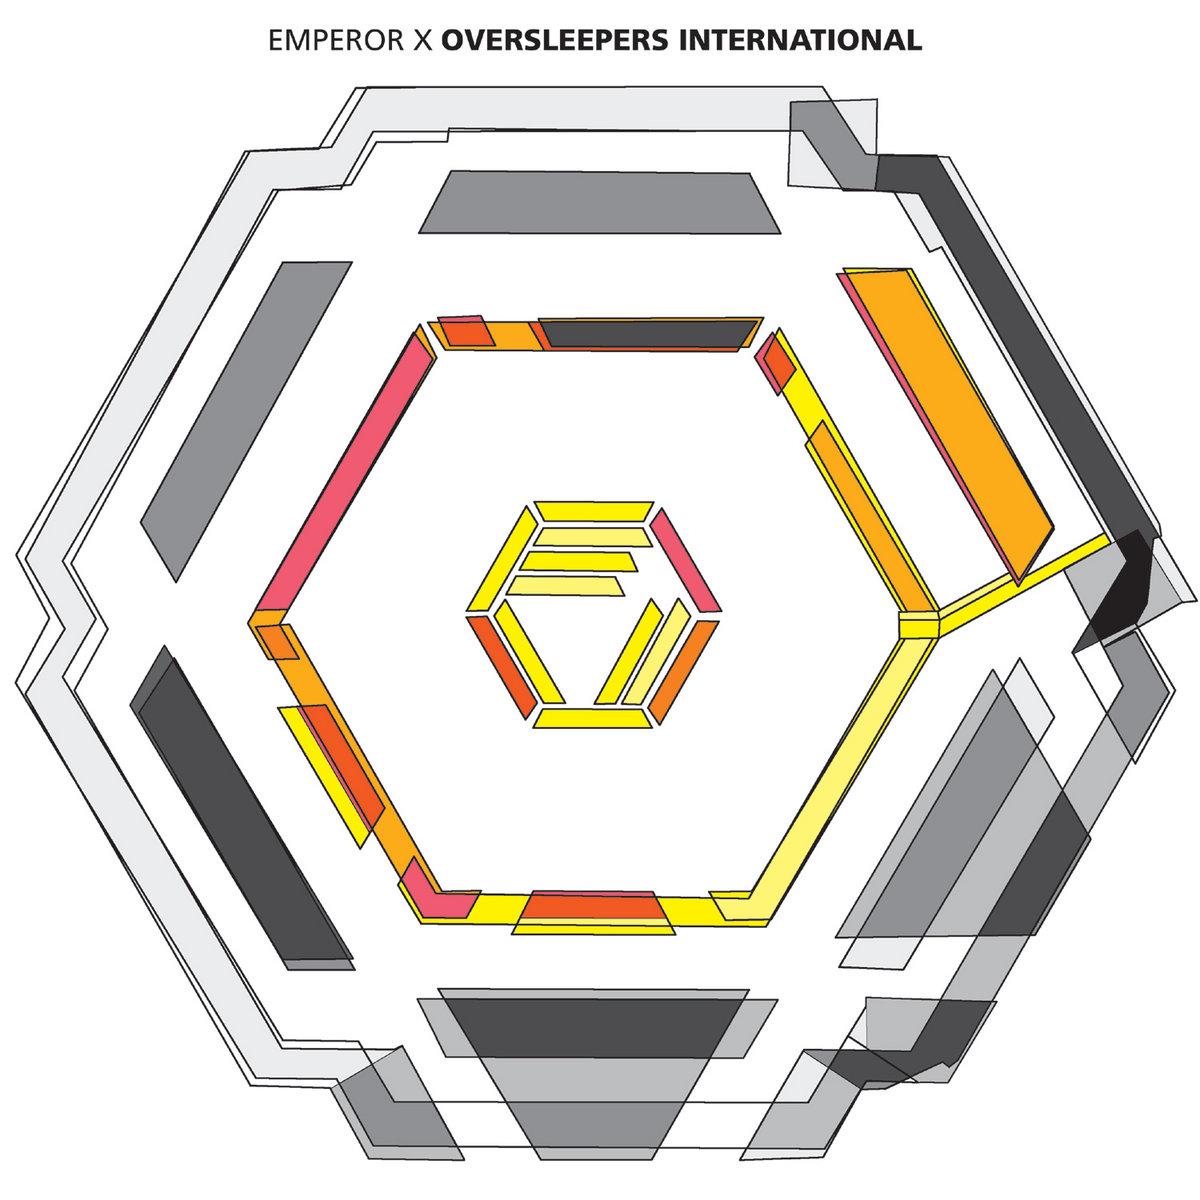 Oversleepers International – Emporer X